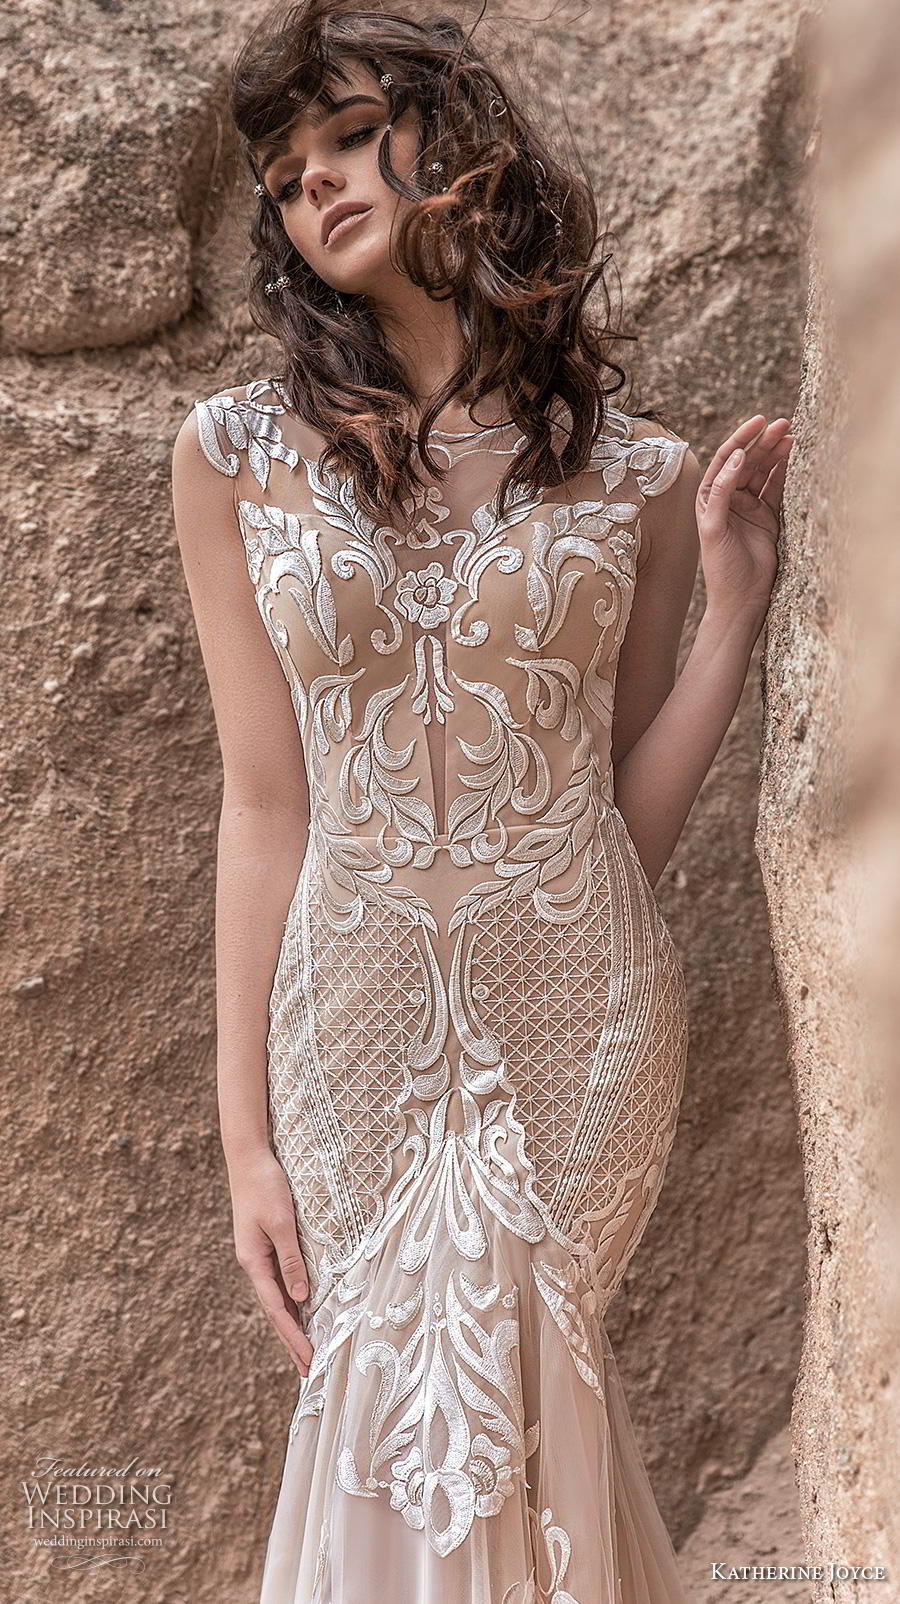 katherine joyce 2020 bridal cap sleeves bateau neckline full embellishment glamorous elegant ivory mermaid wedding dress sheer button low back chapel train (7) zv